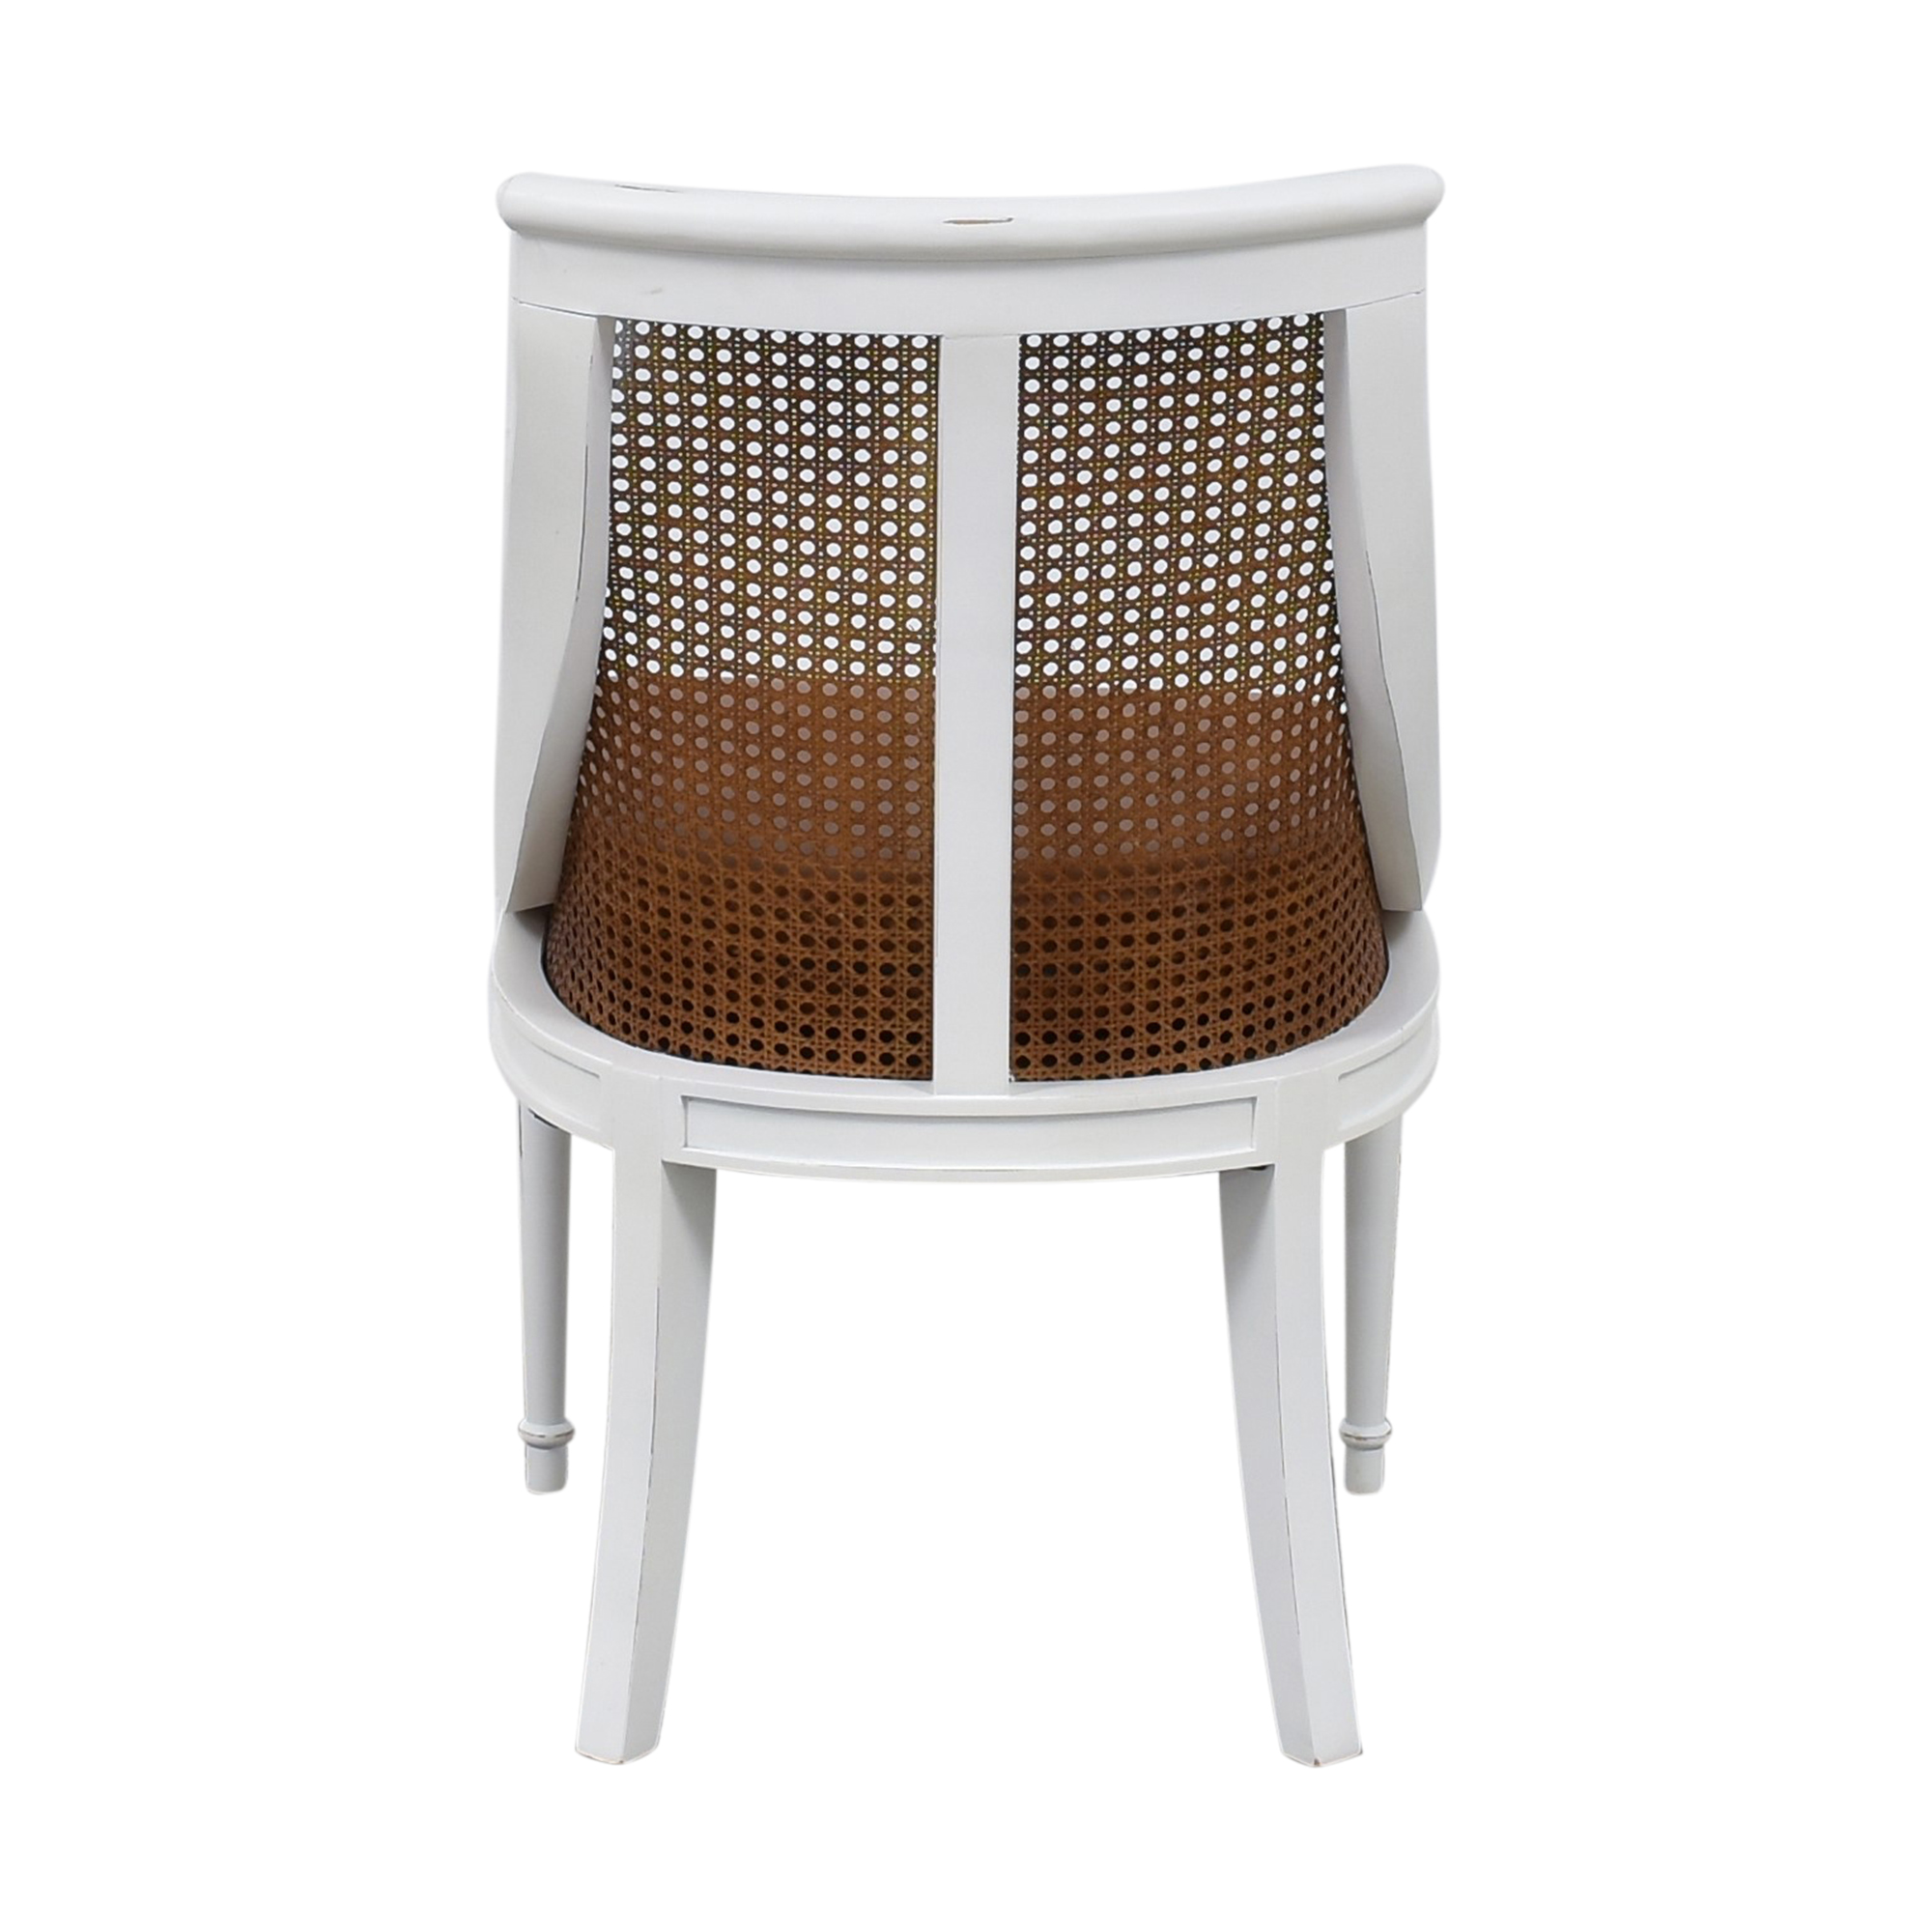 shop Safavieh Saylor Dining Chair Safavieh Chairs